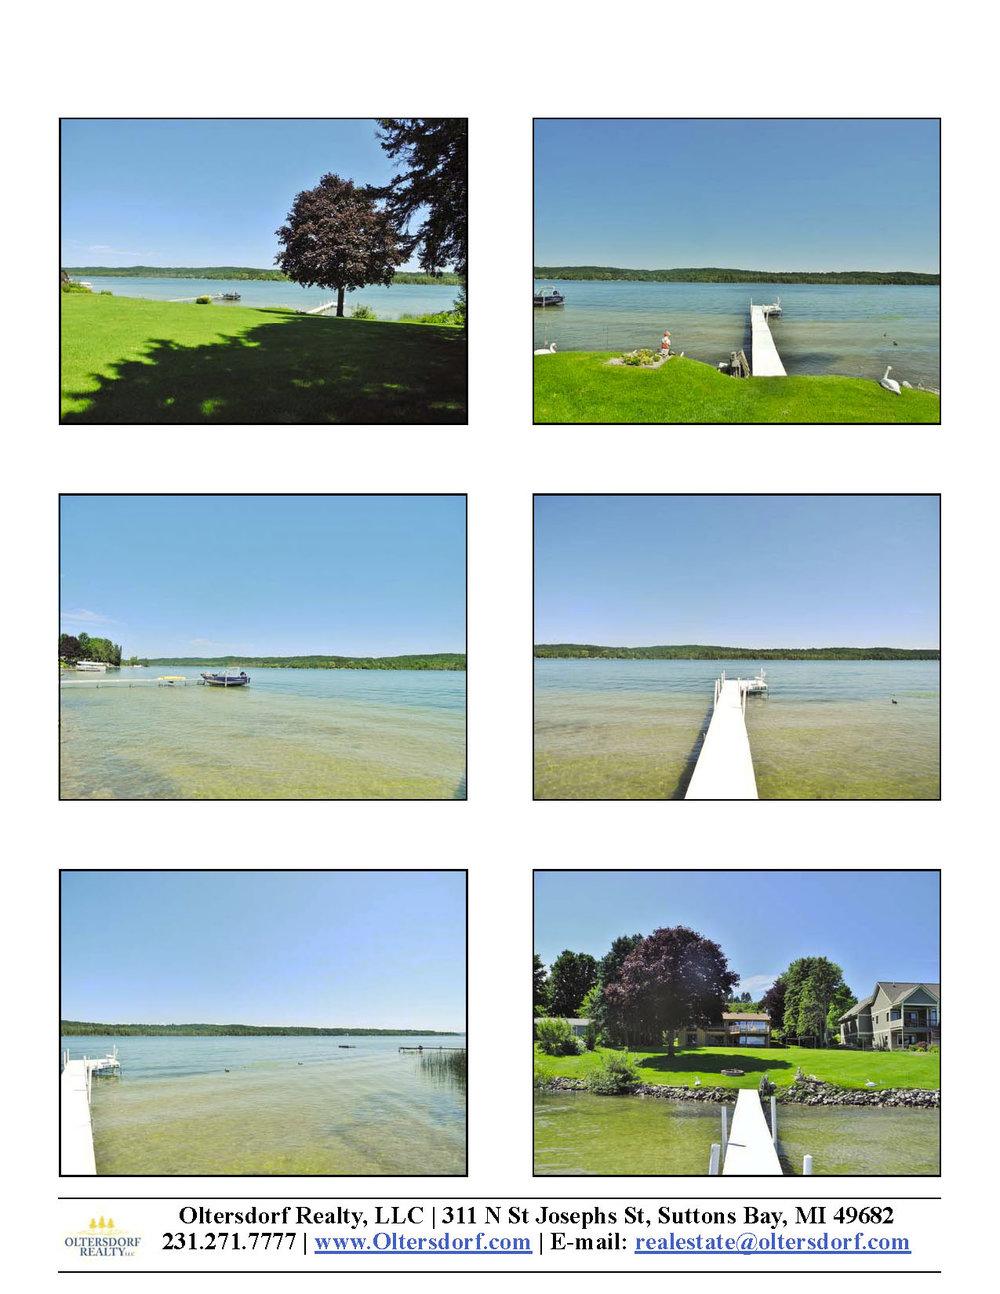 2091 S Lake Shore Drive - Oltersdorf Realty LLC Marketing Packet_Page_03.jpg